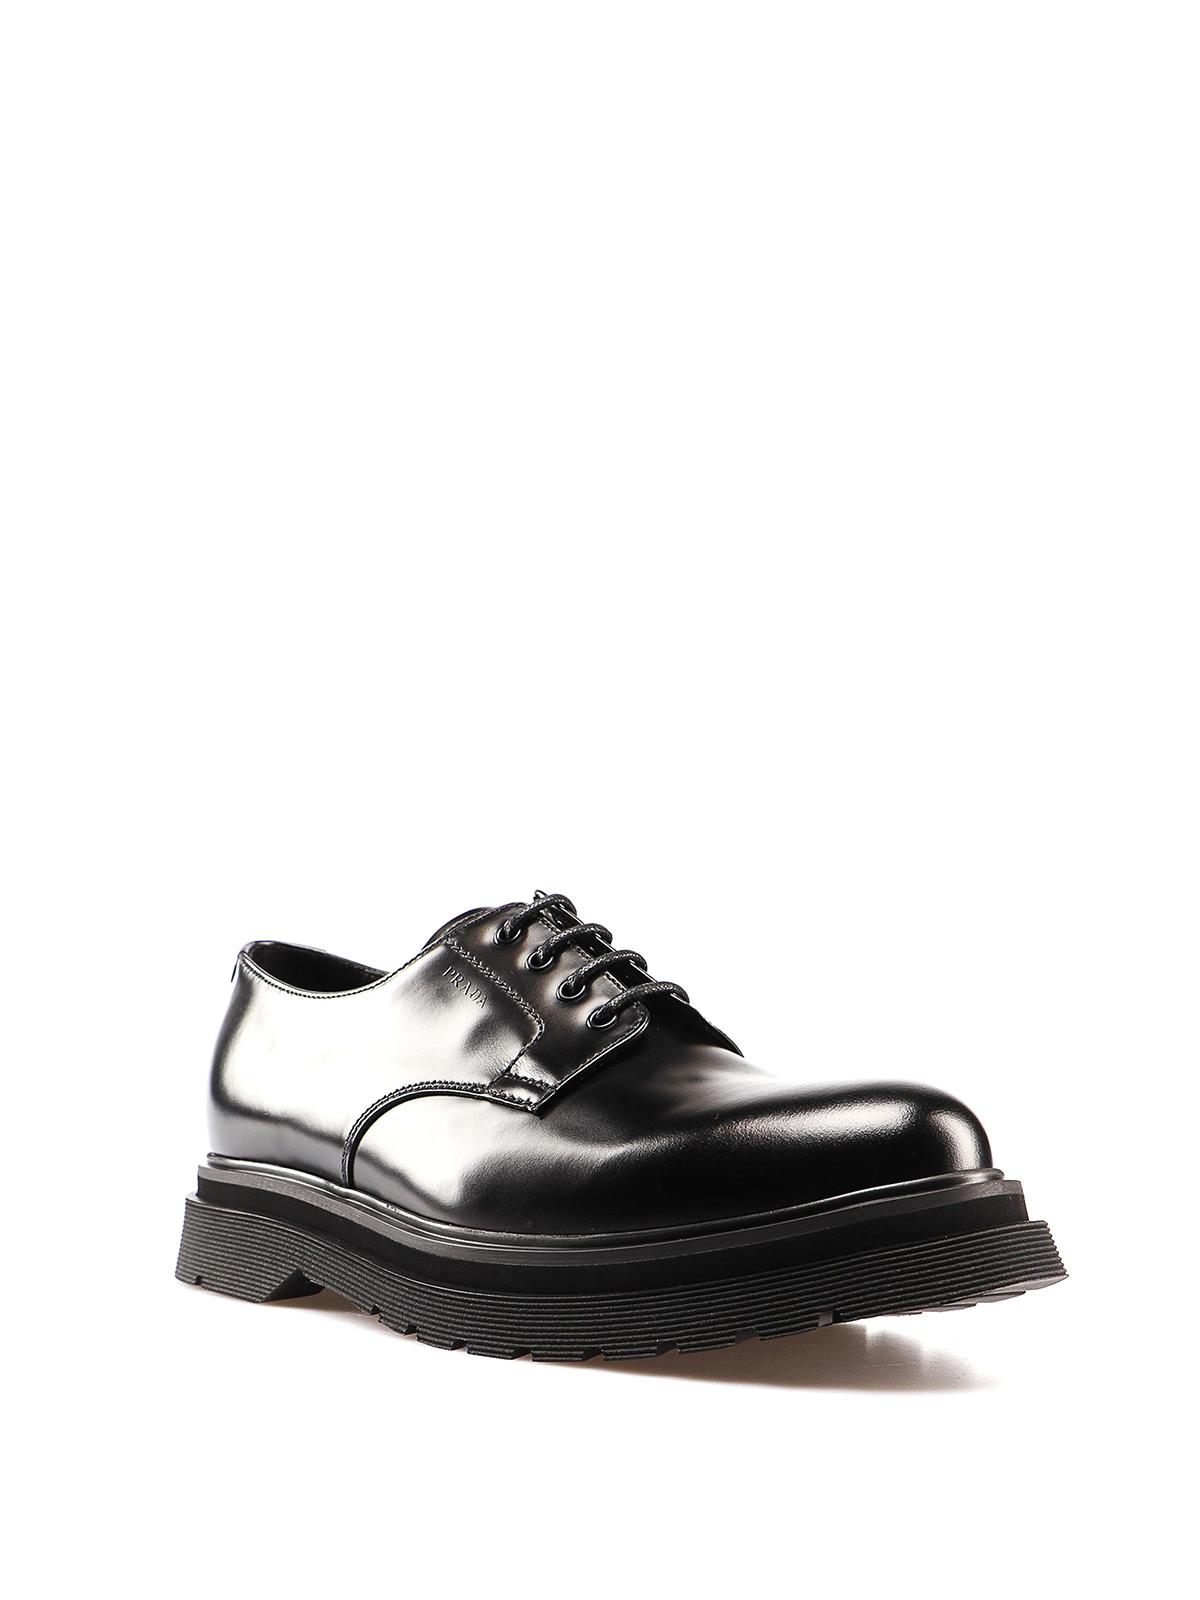 Prada - Chunky sole detailed leather